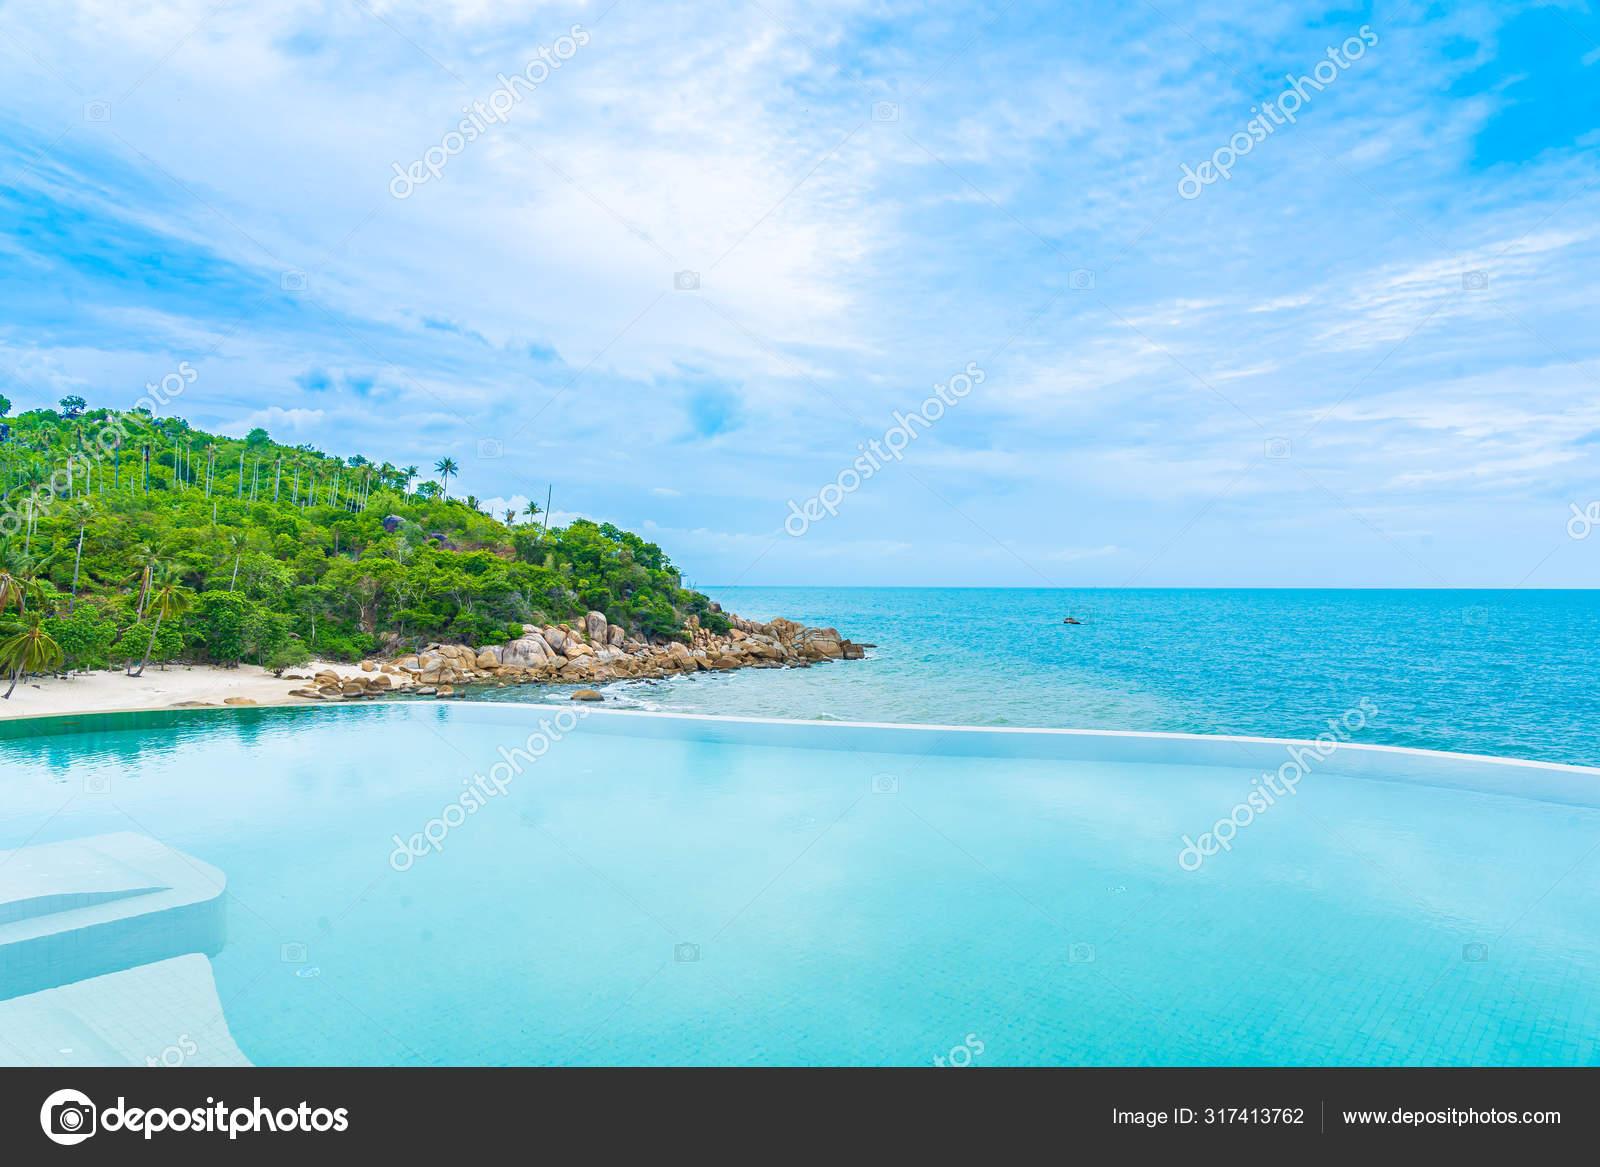 Beautiful Outdoor Infinity Swimming Pool In Hotel Resort With Se Stock Photo C Mrsiraphol 317413762